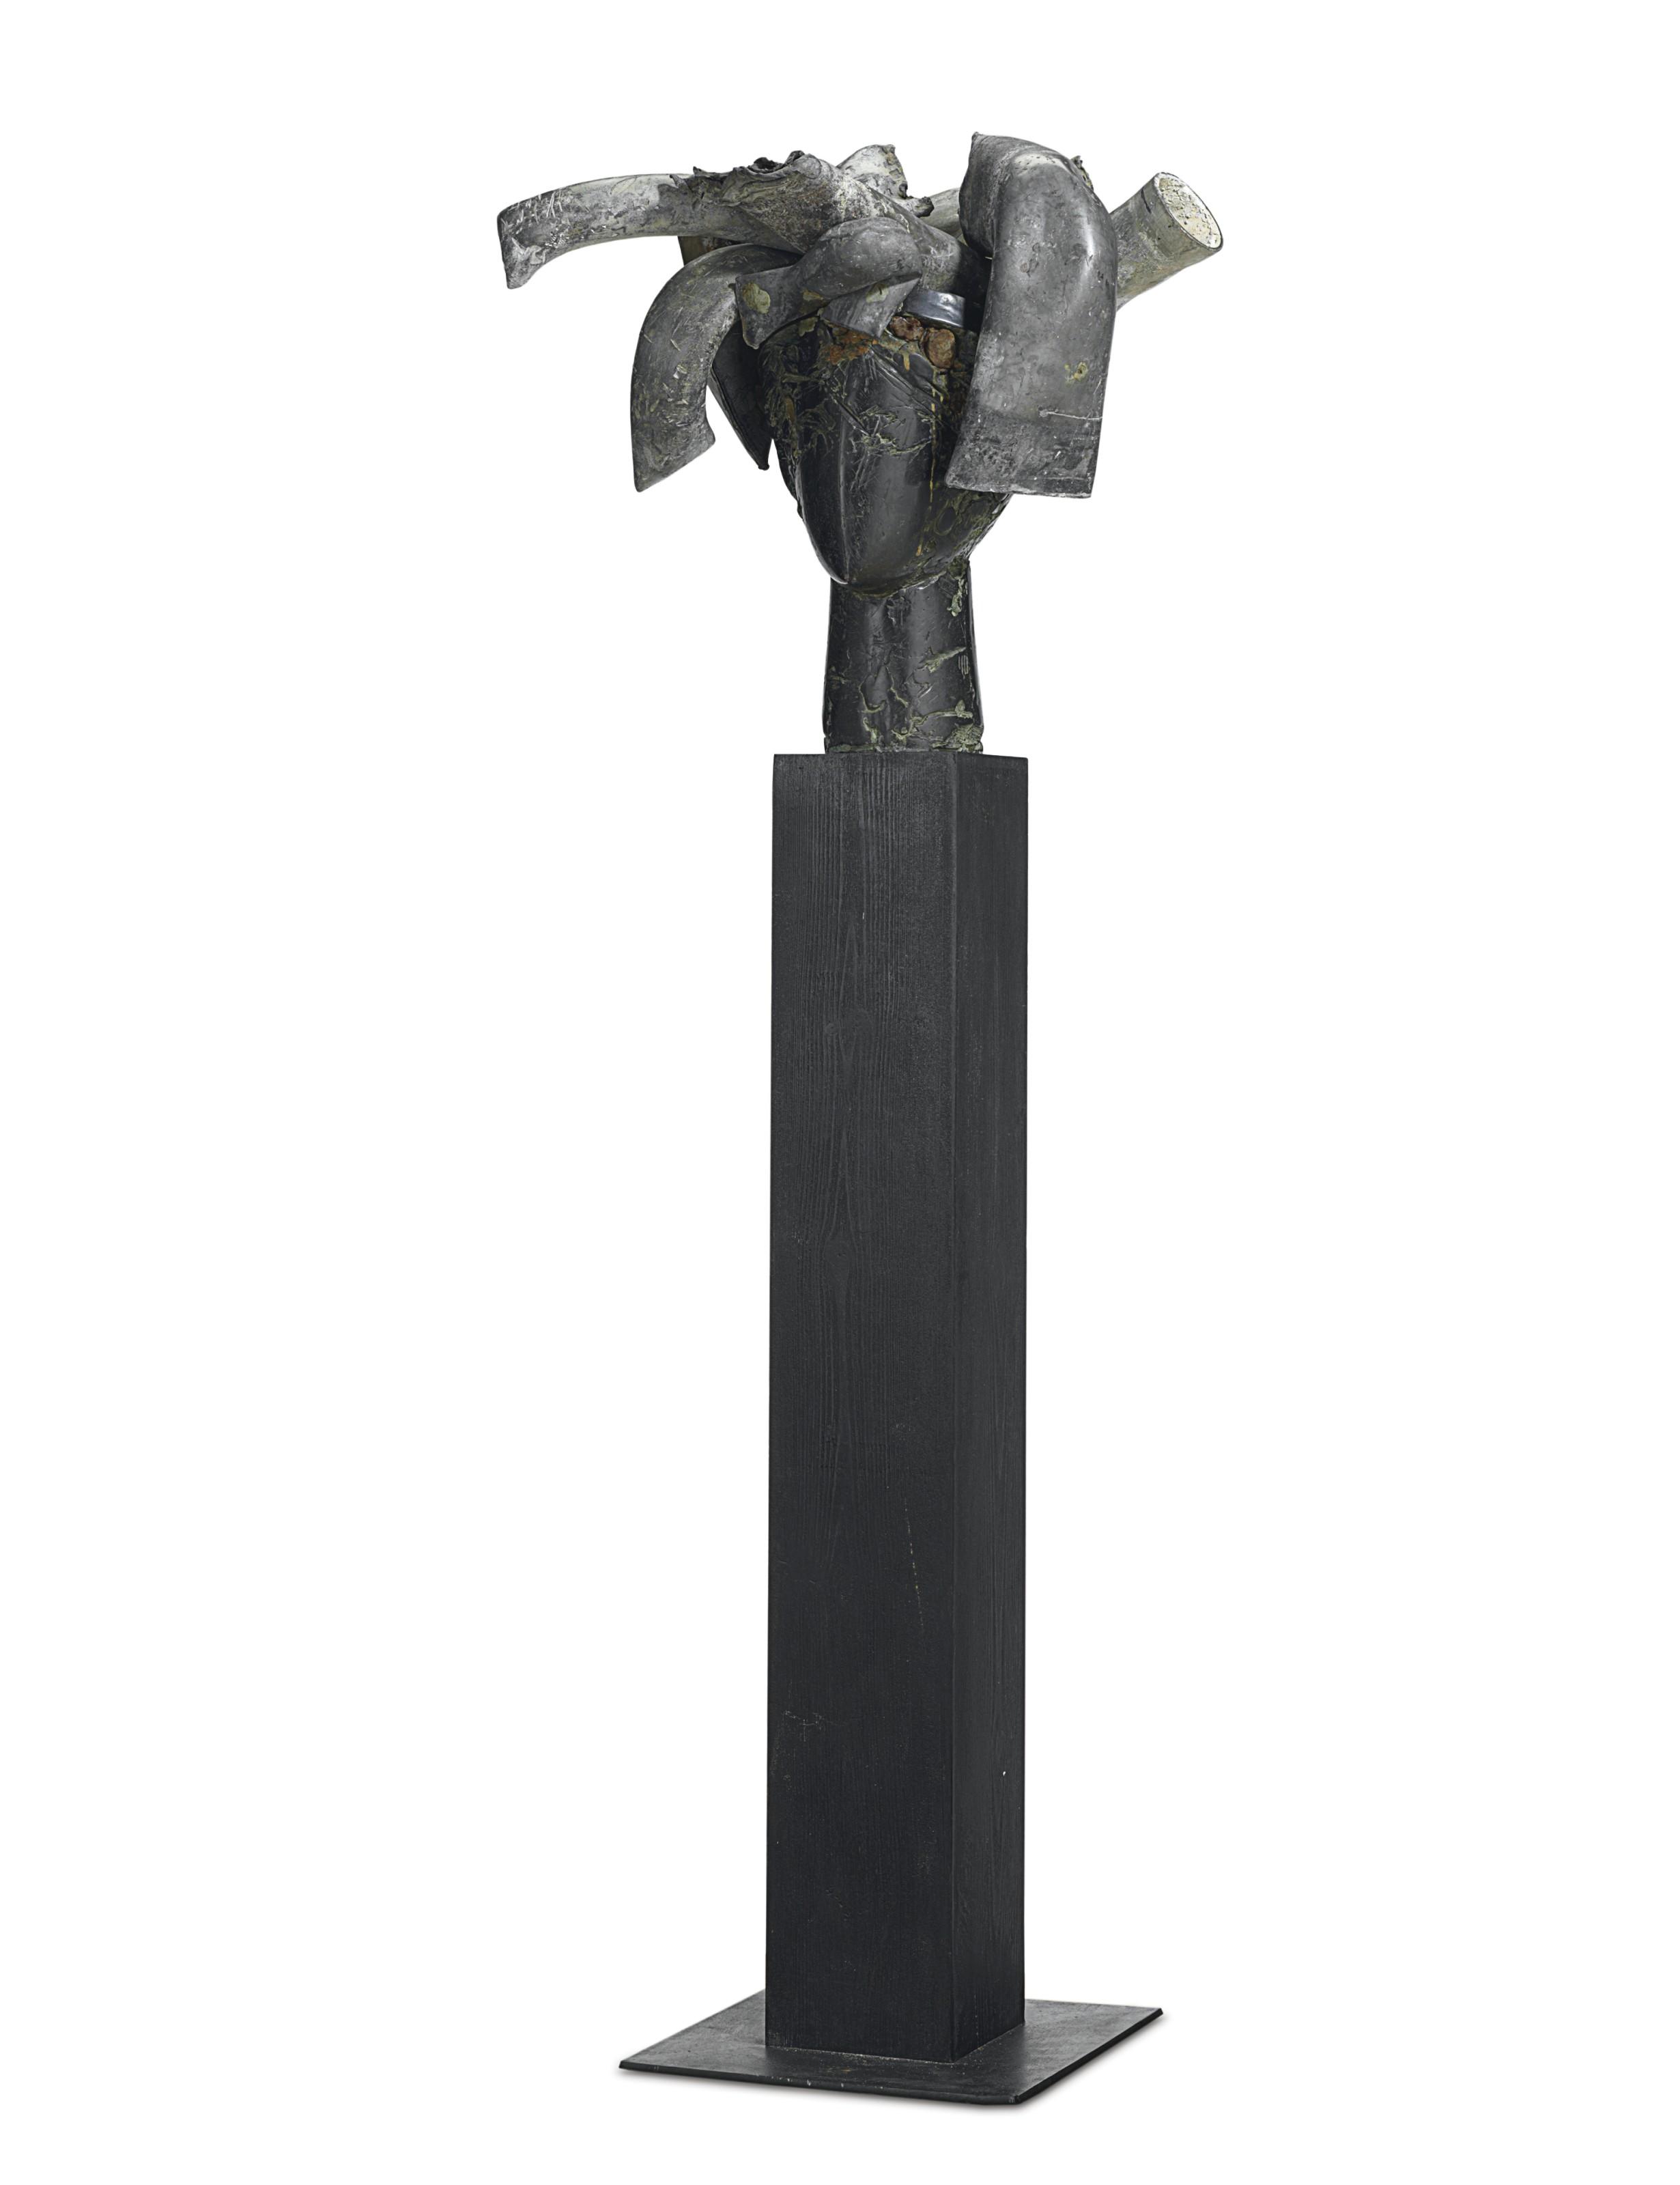 Manolo Valdés (b. 1942)